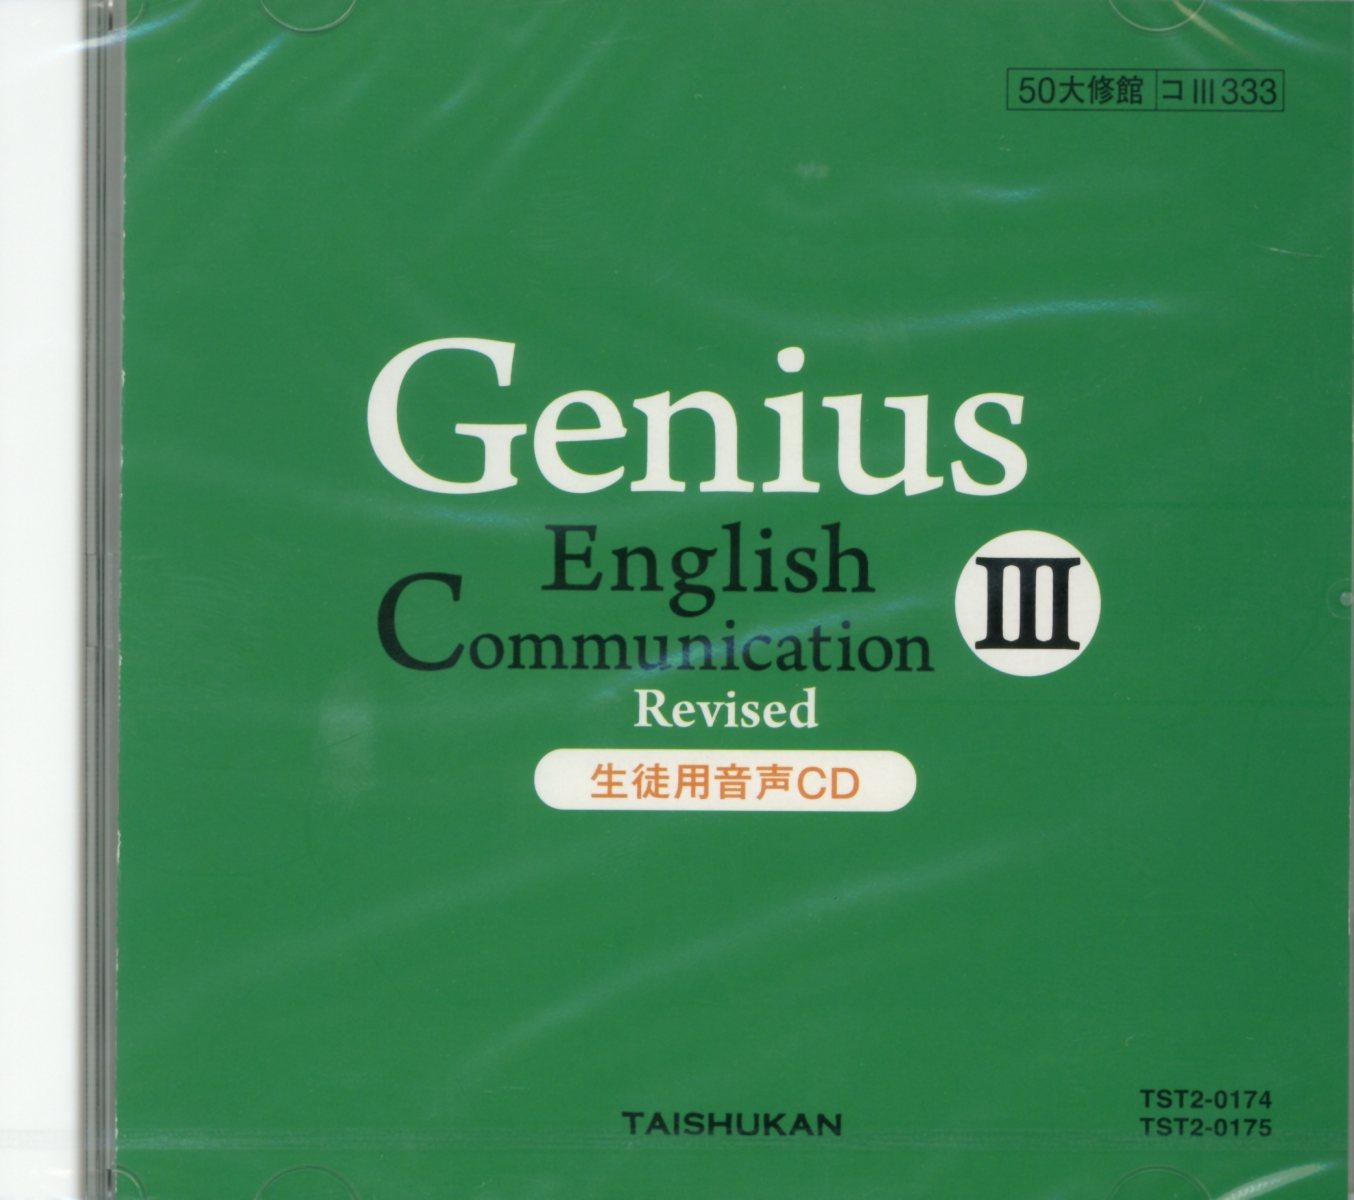 Genius English Communication 3 Revised 生 50大修館 コ 3 333 (<CD>)